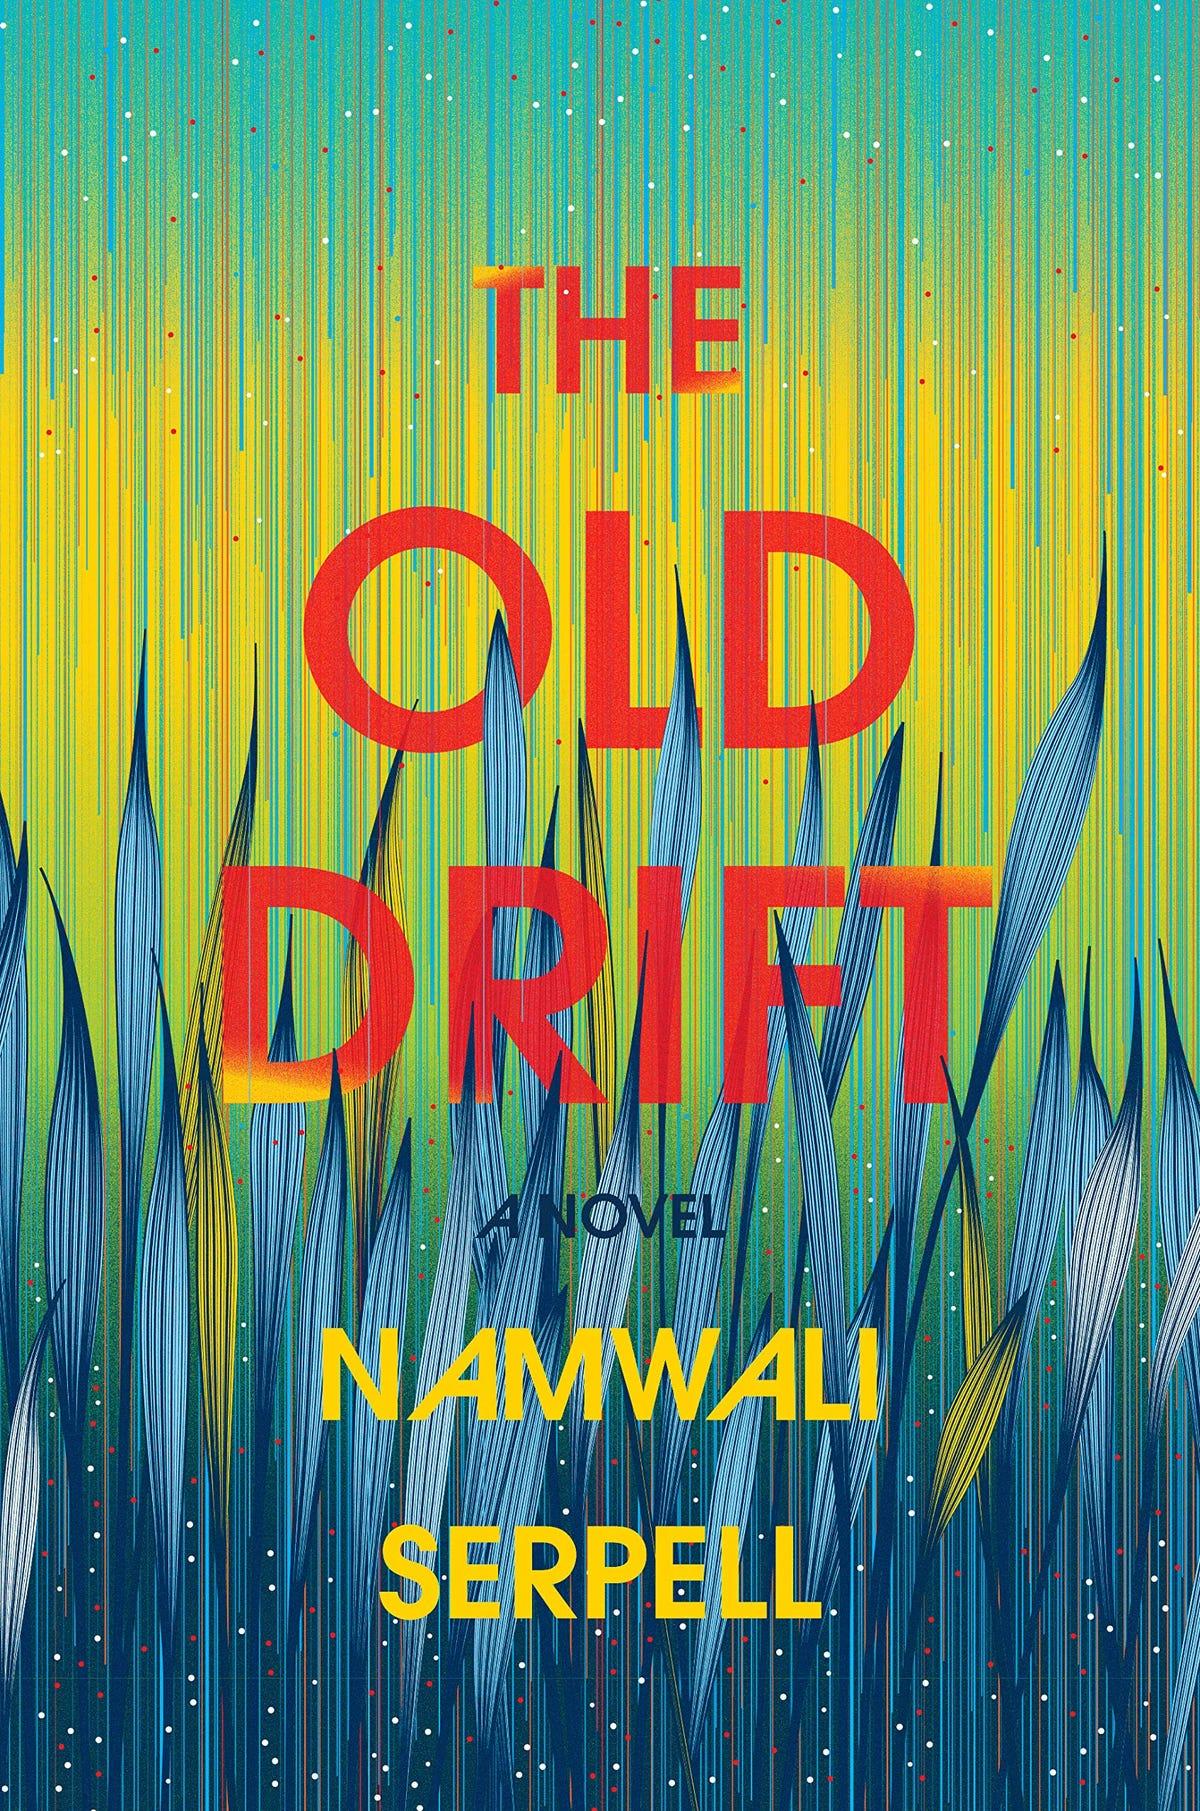 Best Books 2019 Upcoming Fiction & Non-Fiction Novels